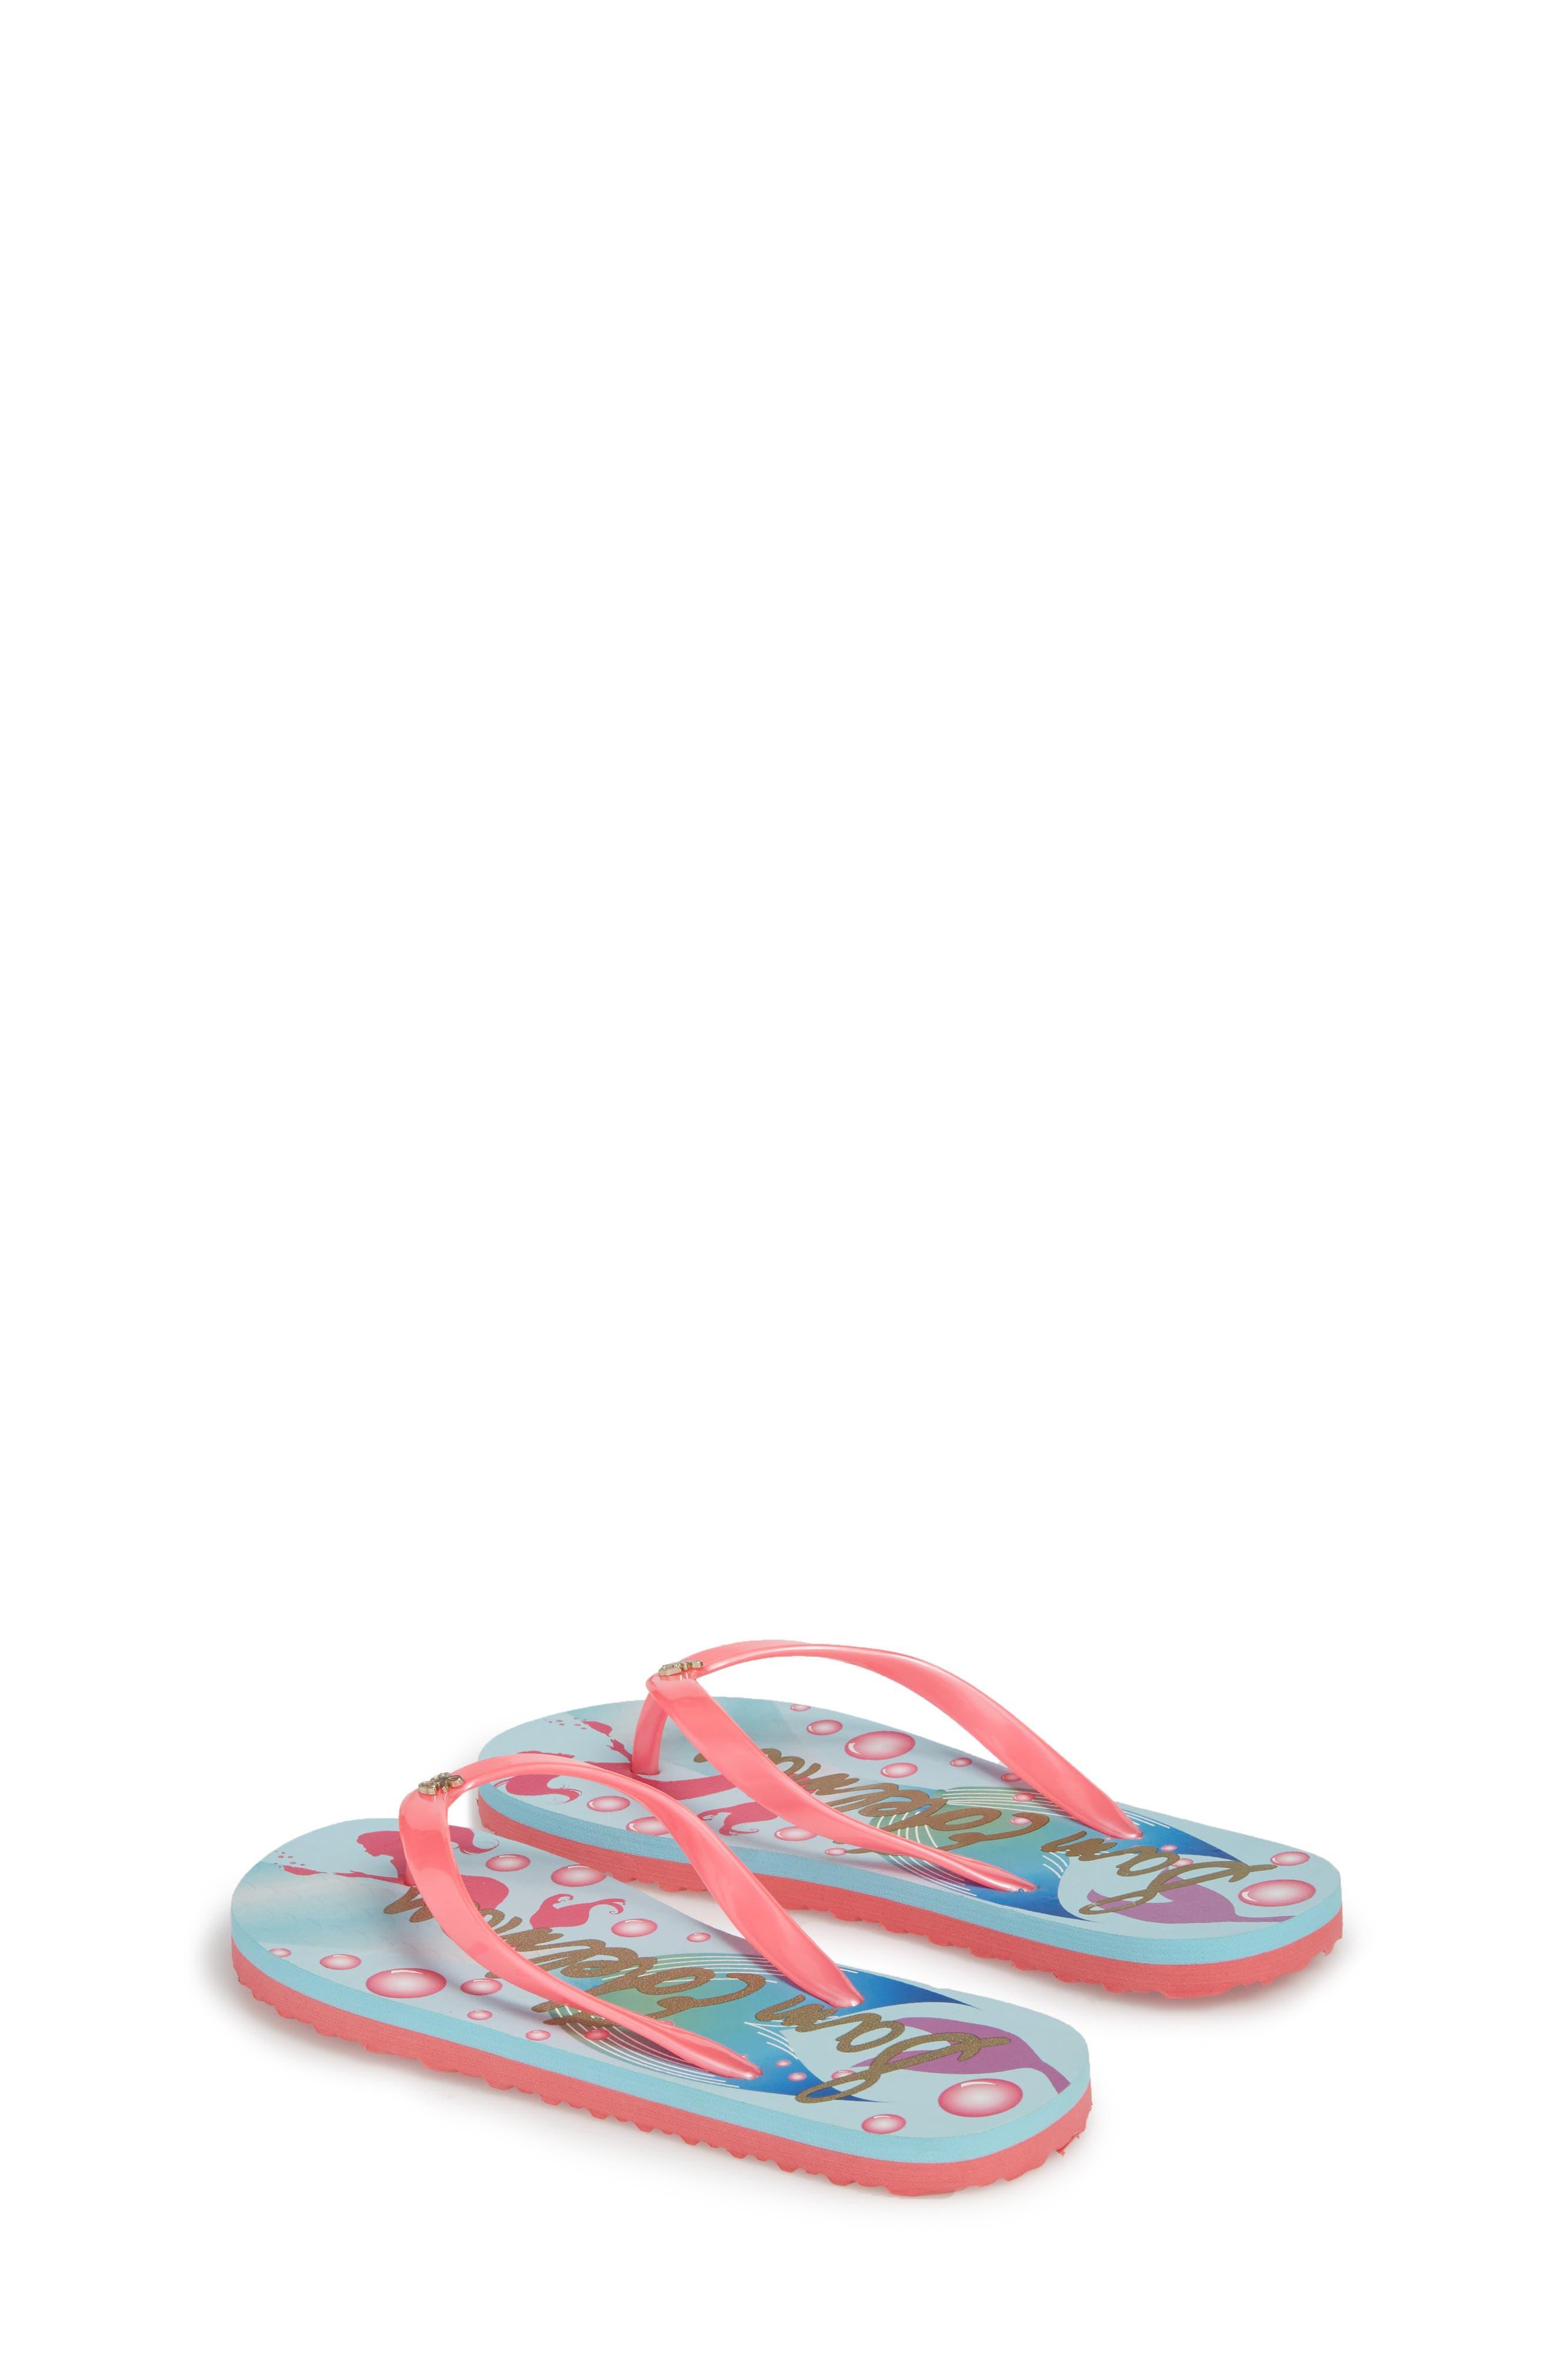 Mandy Flip Flop,                             Alternate thumbnail 2, color,                             Mermaid Turquoise/ Pink